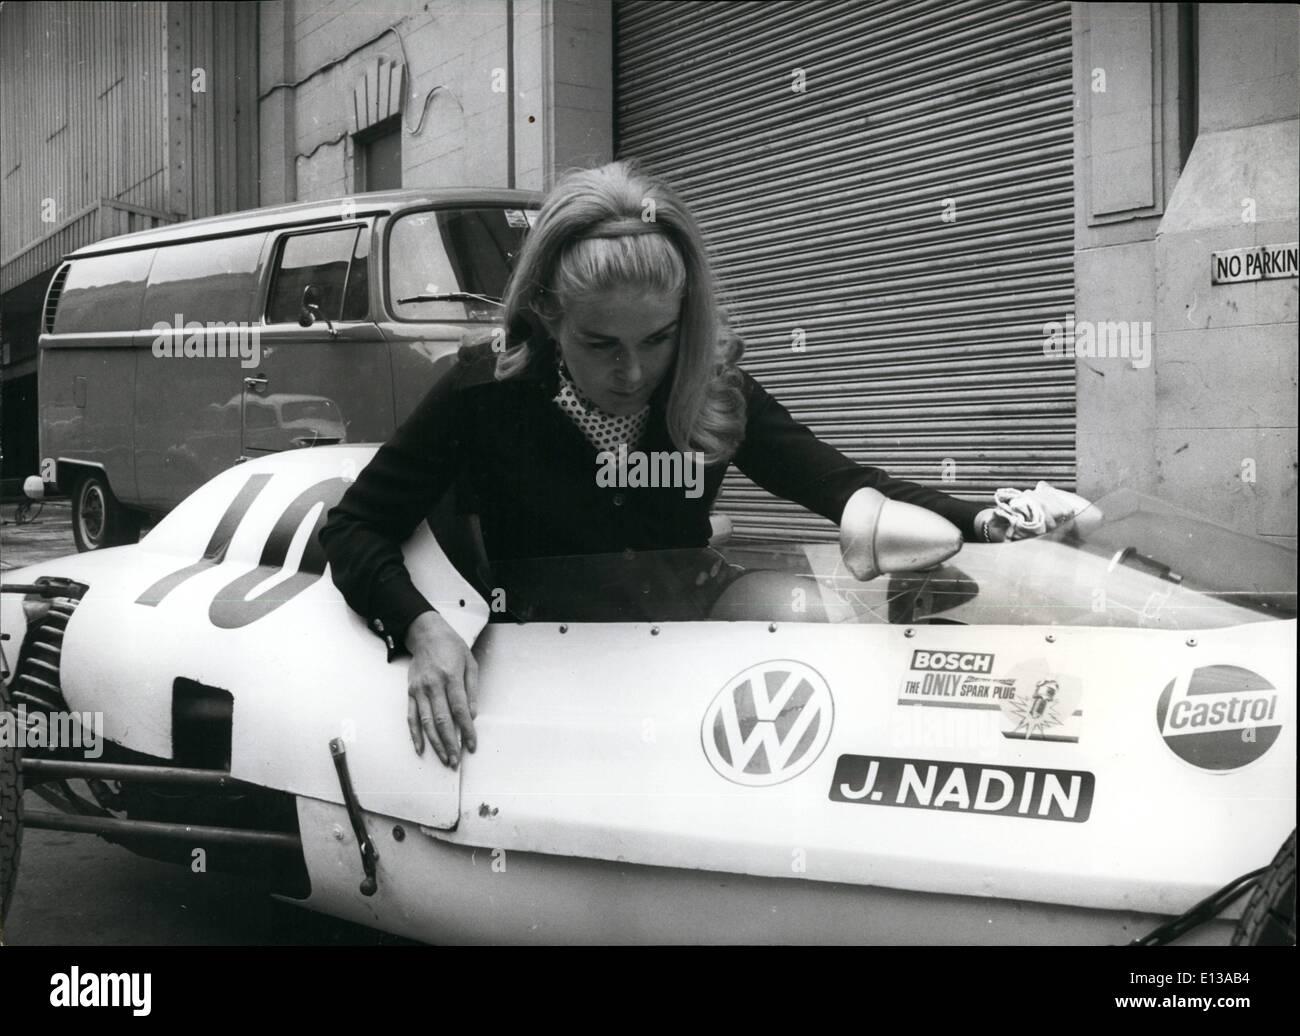 Feb. 29, 2012 - Johnny Nadin with her single seater formula vdo 15,000 c.c. racing car. - Stock Image